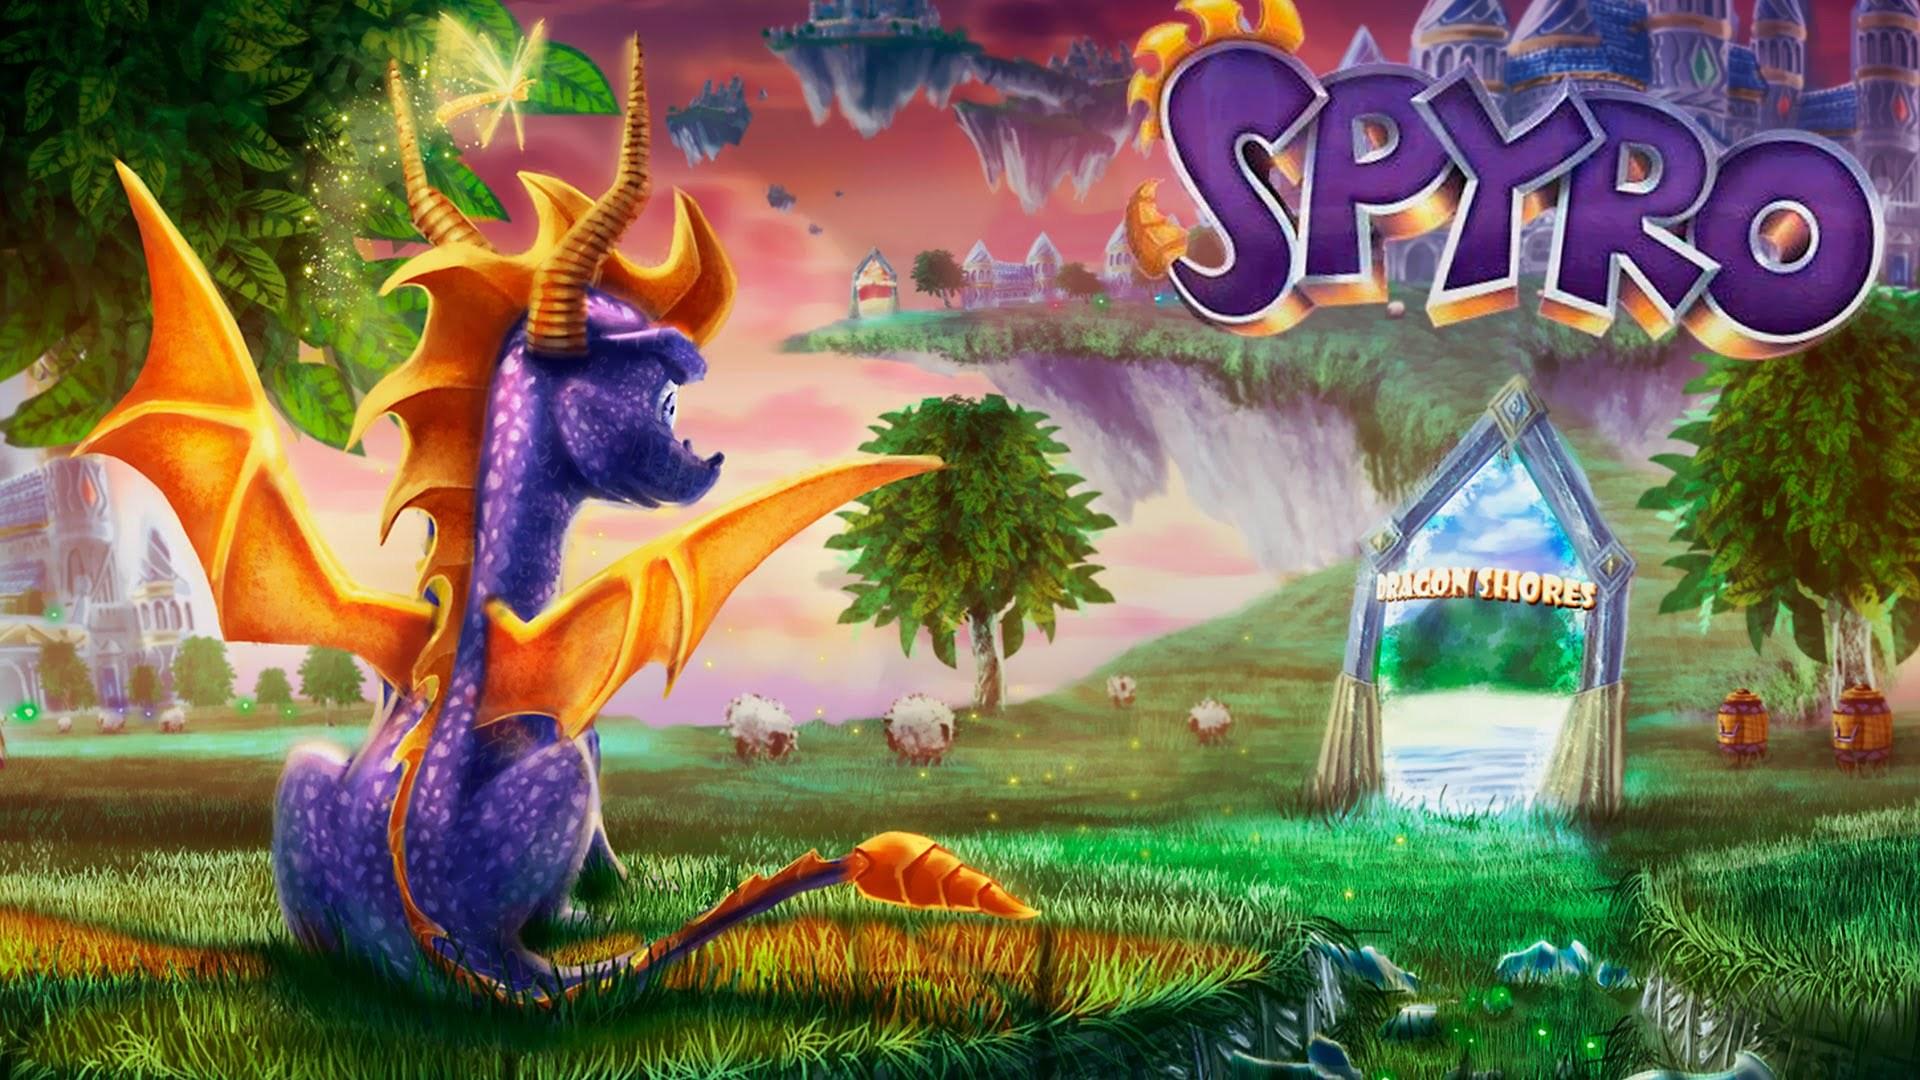 Spyro reignited trilogy lights up your ps4 this september - Spyro wallpaper ...